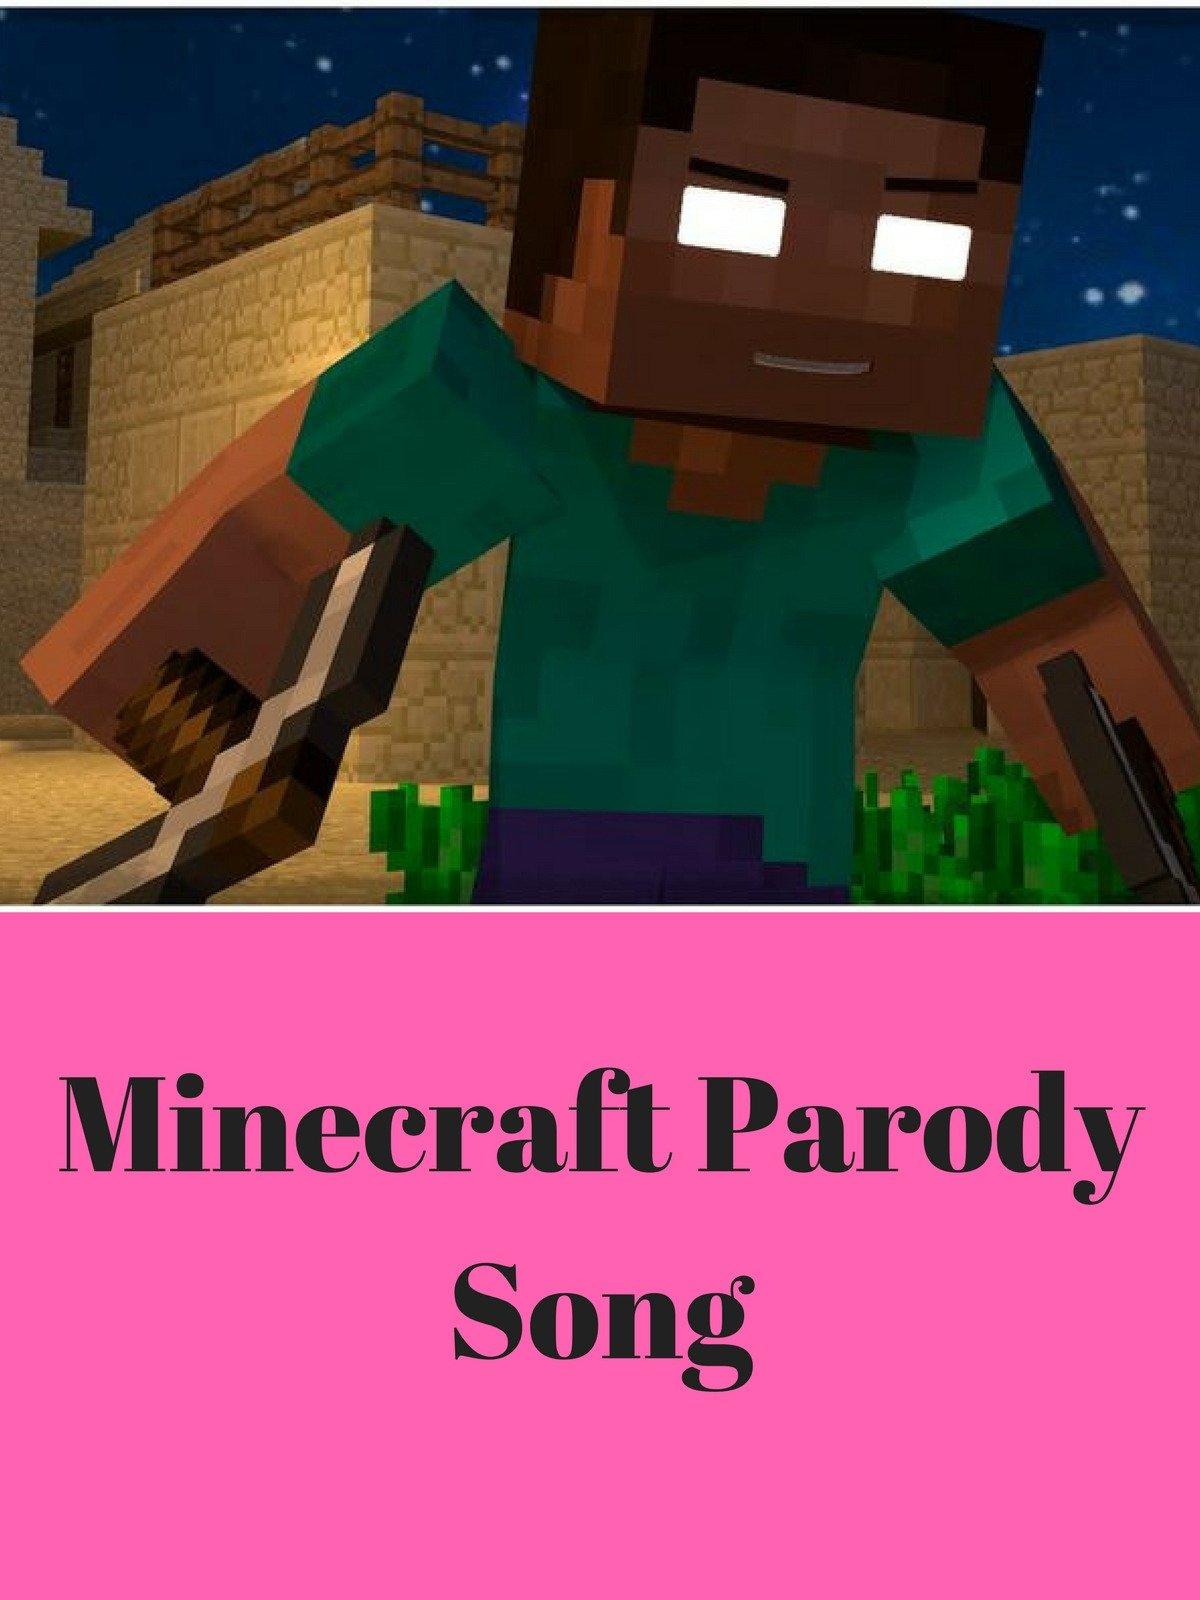 Amazon com: Minecraft Parody Song: Steve, Enederdragon